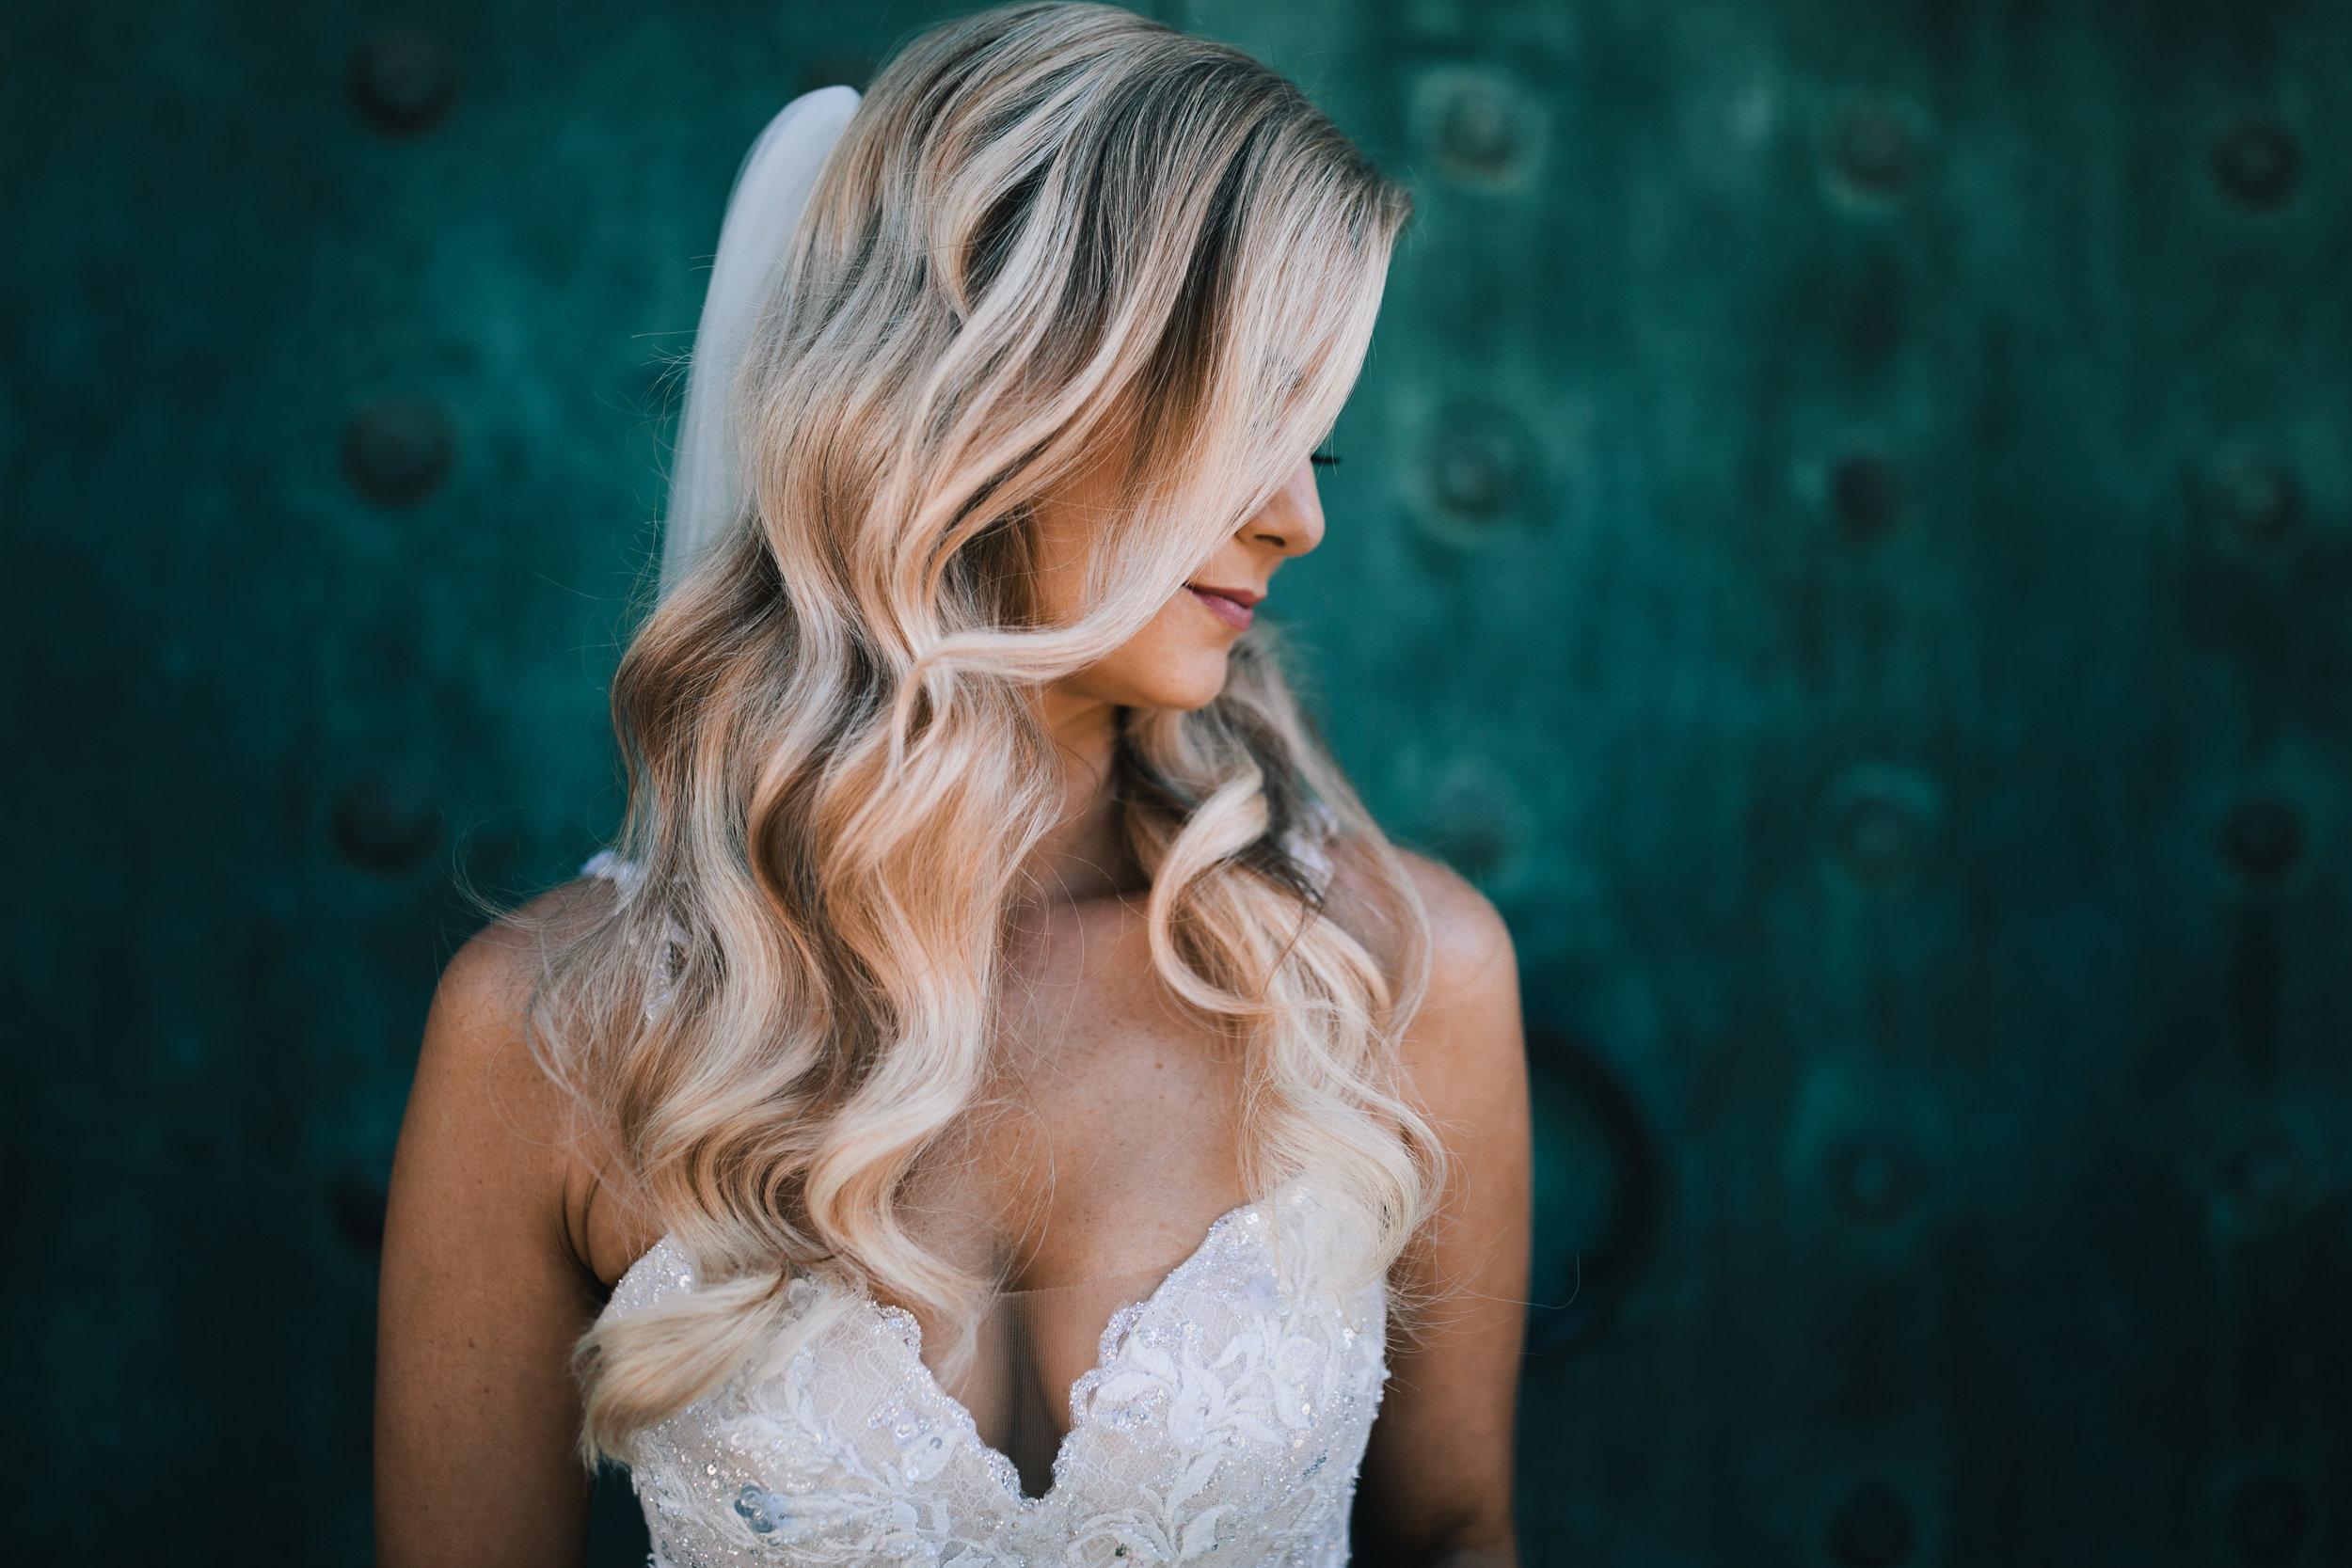 2018.09.08 Litsa and Sofo Greek Wedding Sneak Peak-9.jpg